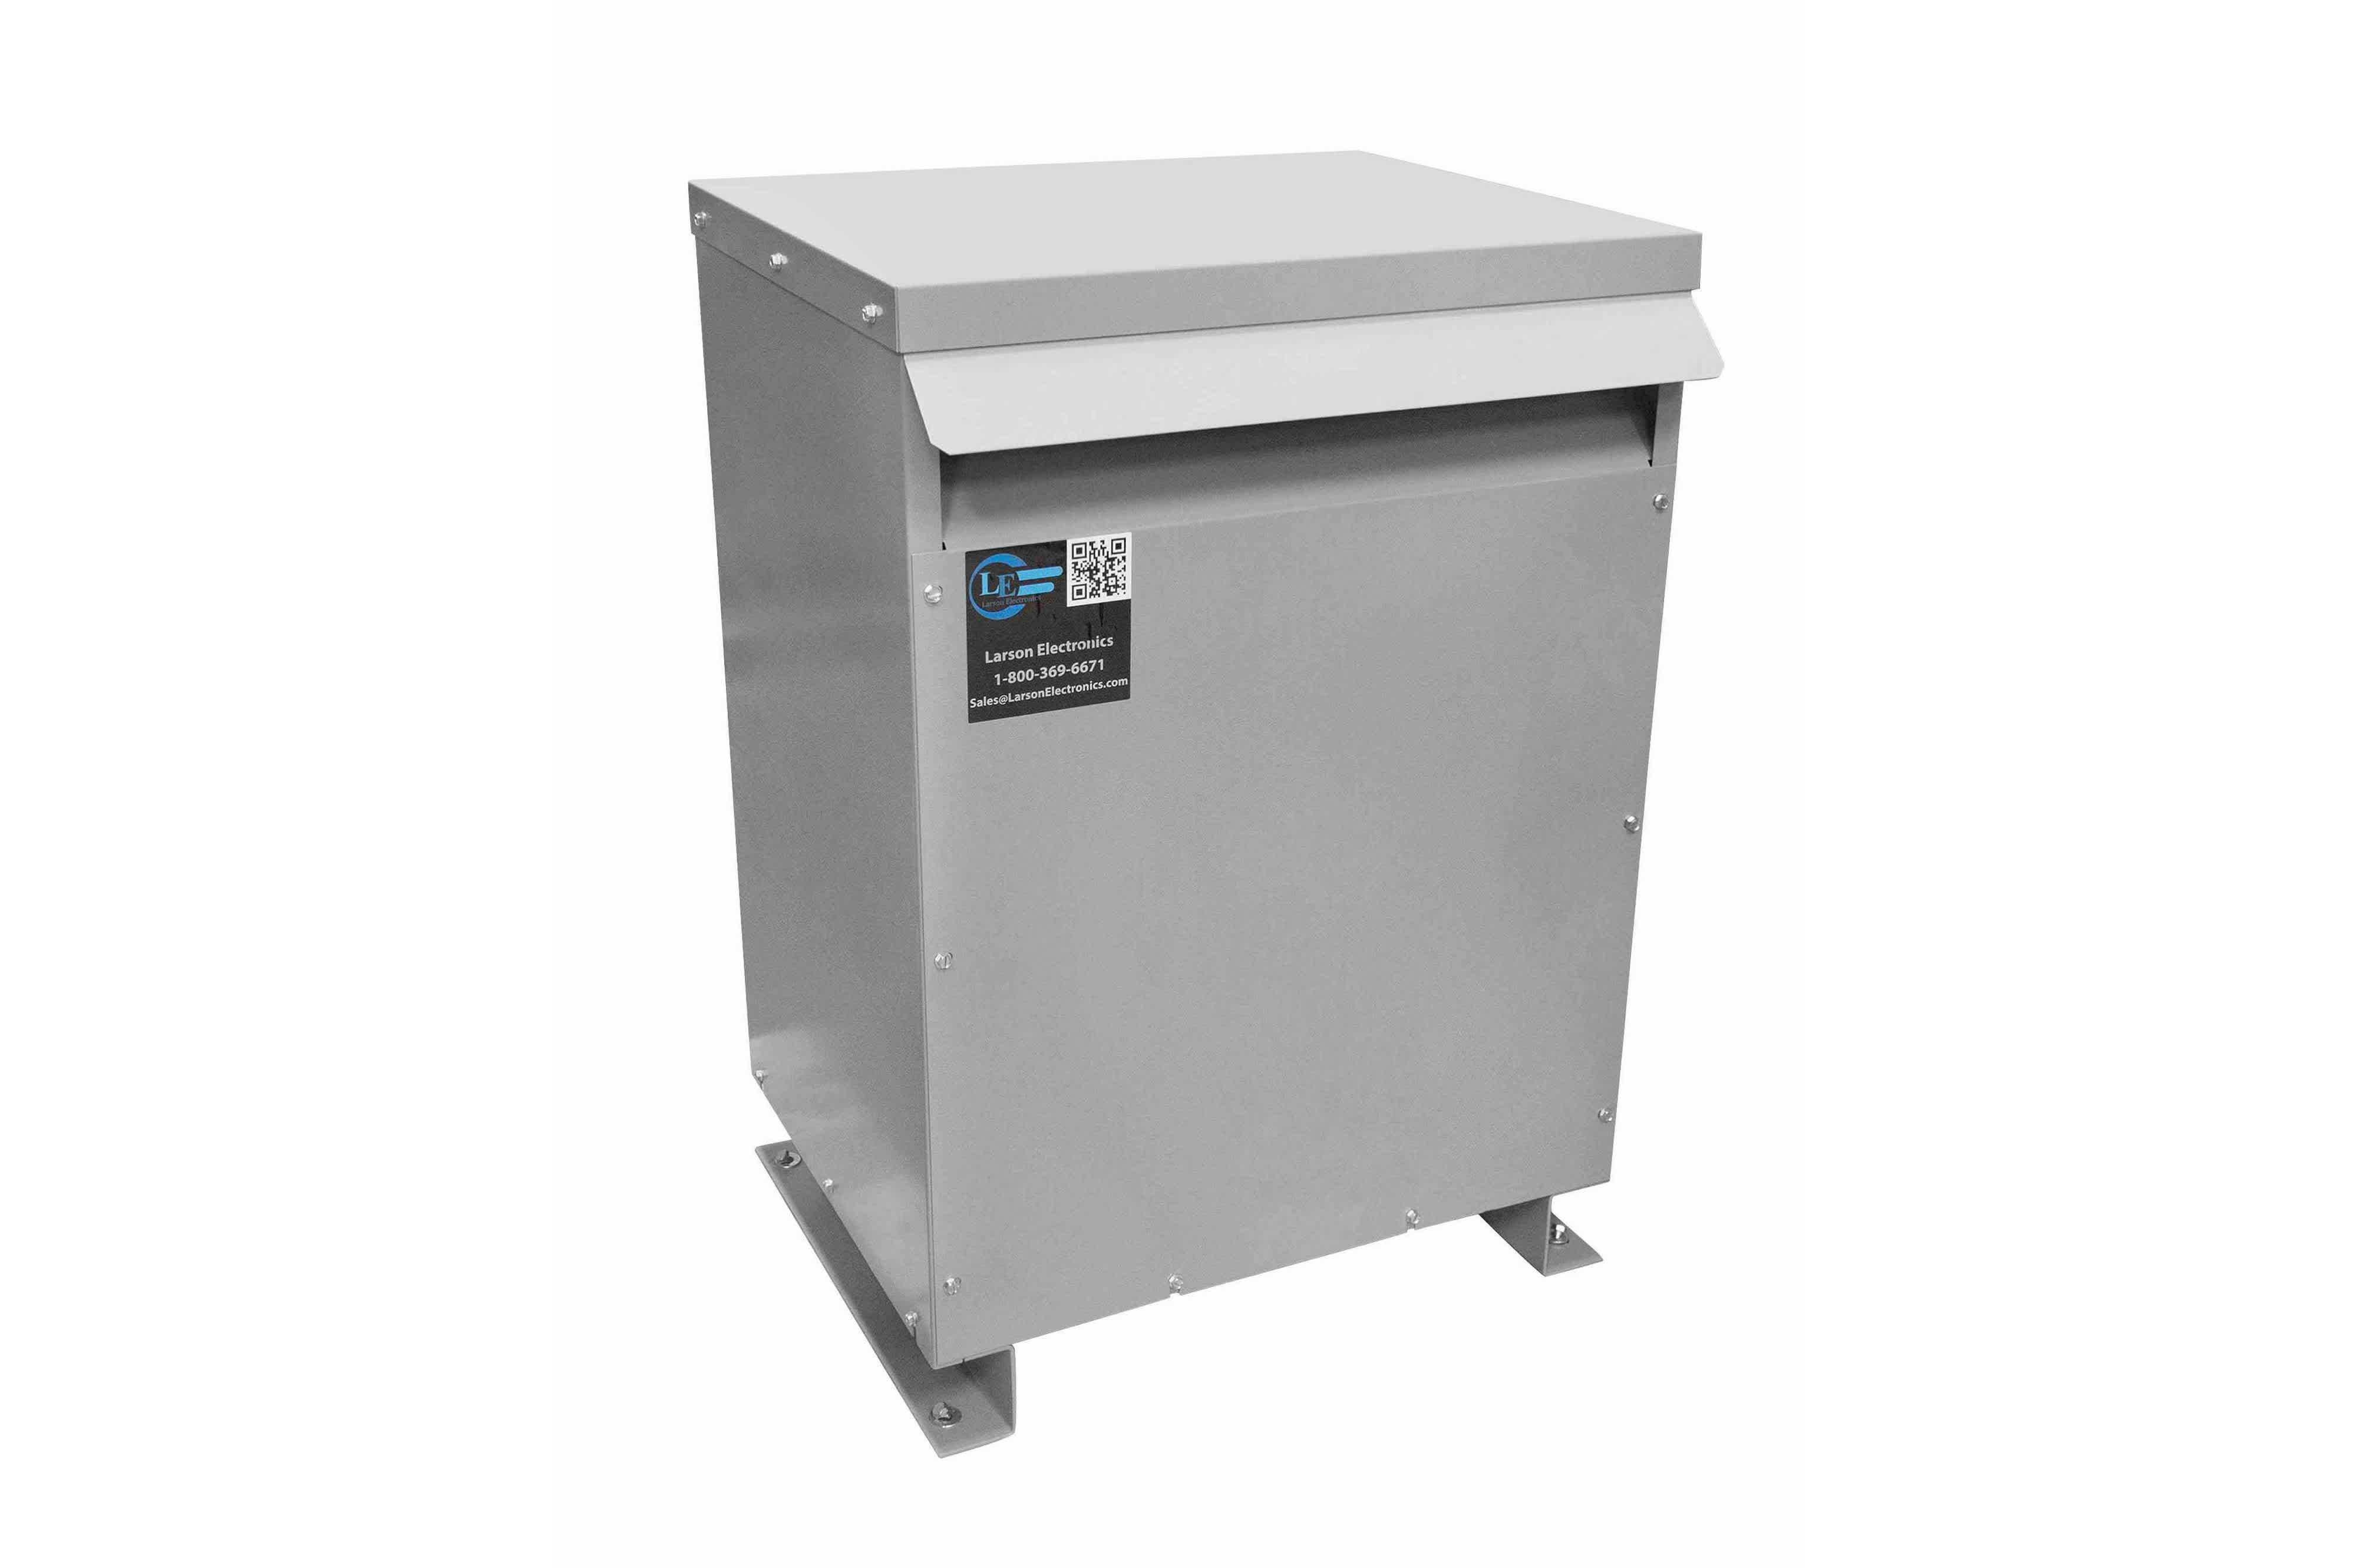 18 kVA 3PH Isolation Transformer, 400V Wye Primary, 600Y/347 Wye-N Secondary, N3R, Ventilated, 60 Hz